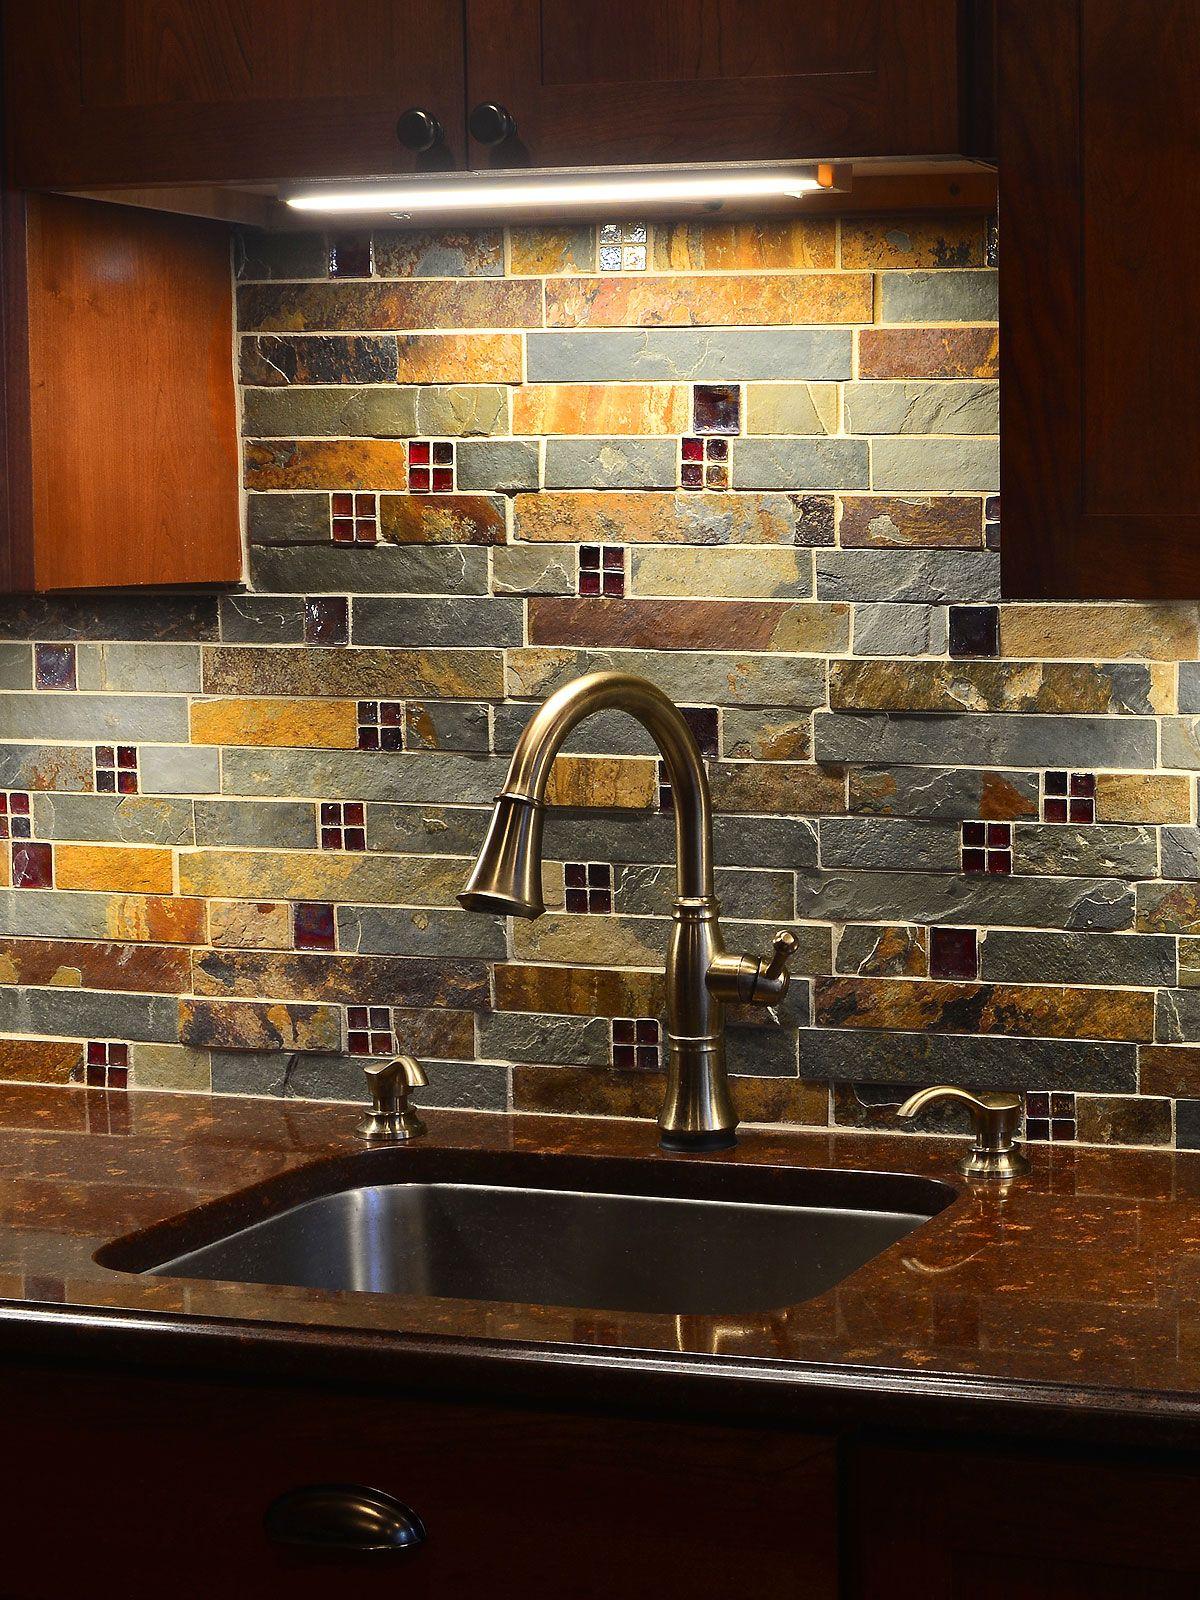 Subway Slate Glass Mosaic Kitchen Backsplash Tile Kitchen Tiles Backsplash Mosaic Backsplash Kitchen Tile Backsplash